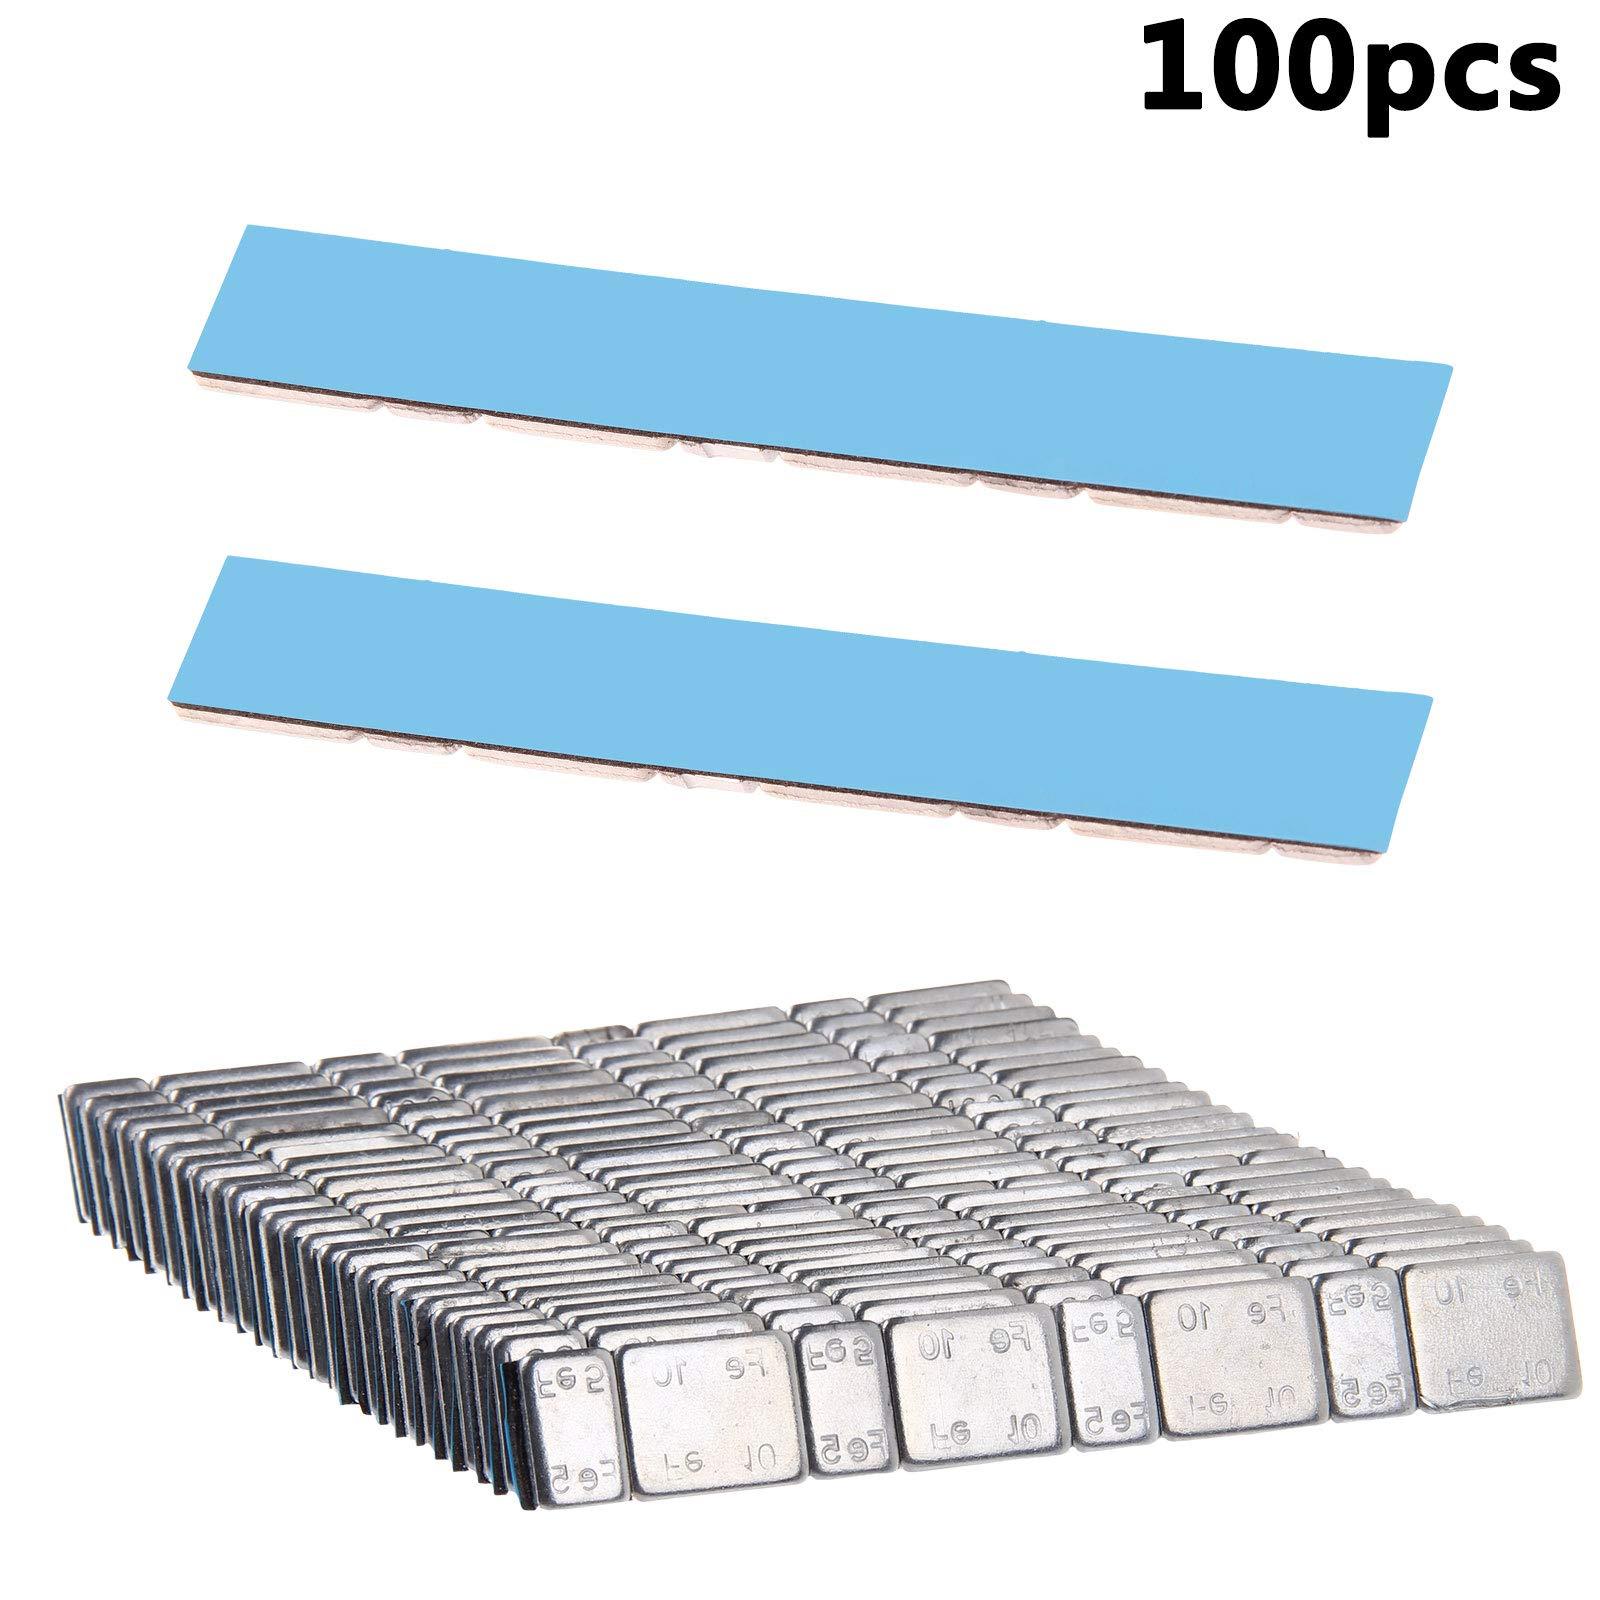 KingSaid Pack of 100 Self Adhesive Wheel Balance Weights 600g Total